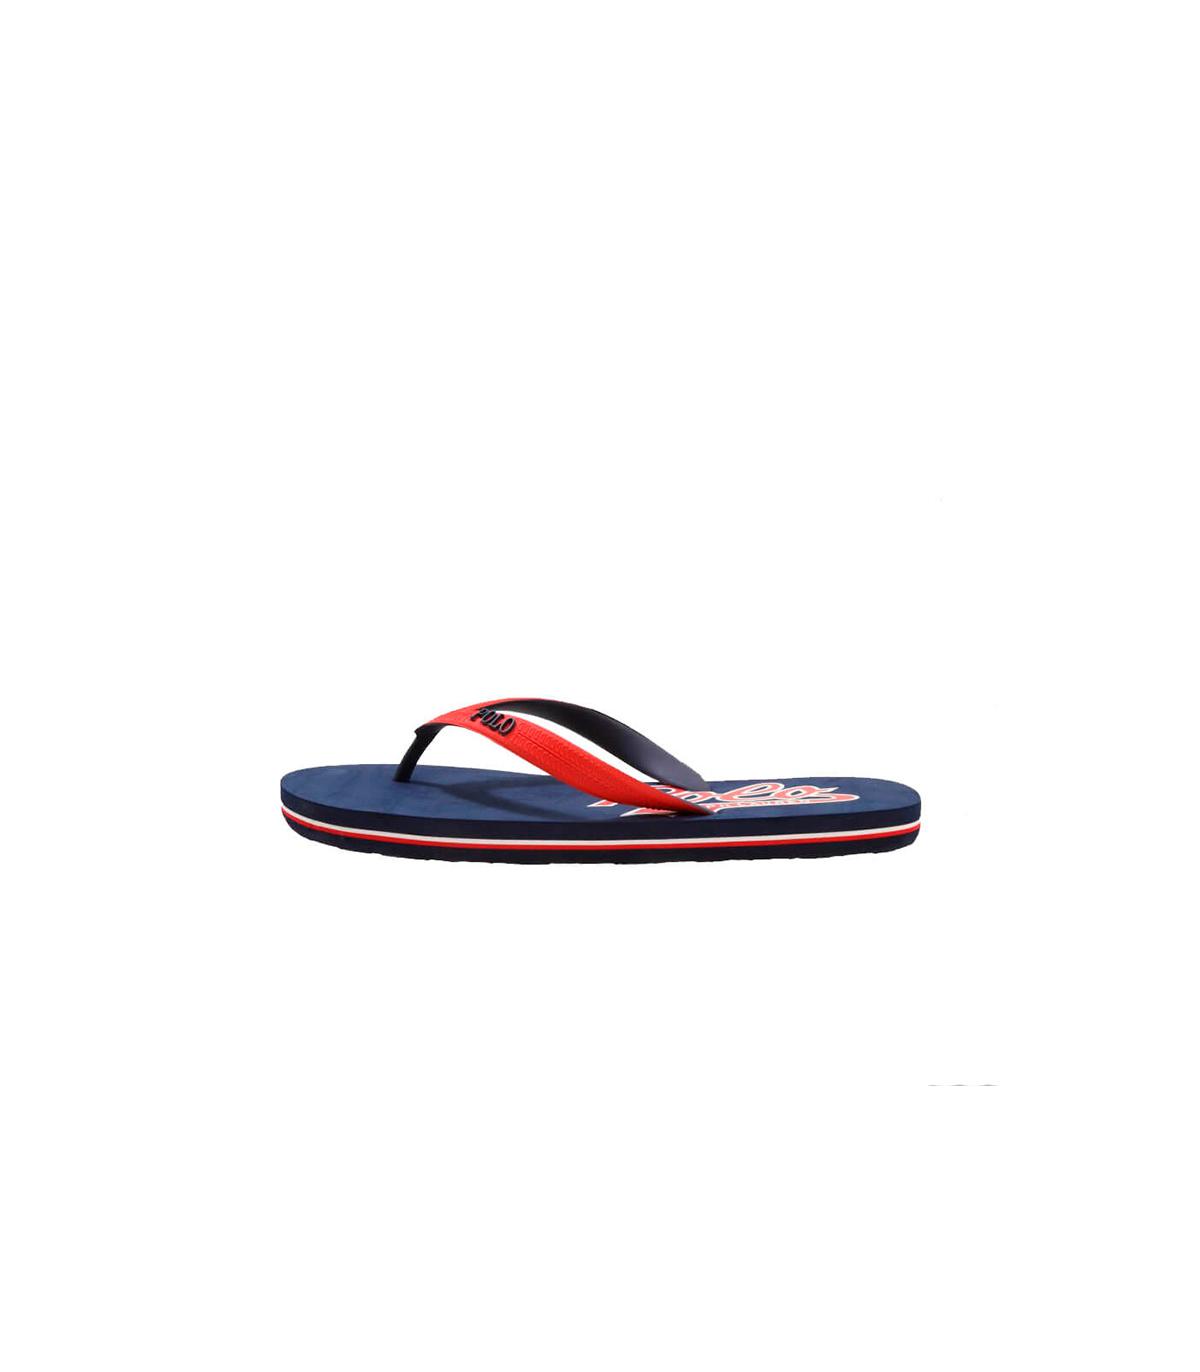 f5df9f5c5 Buy Ralph Lauren Whitleburry Blue Flip Flops